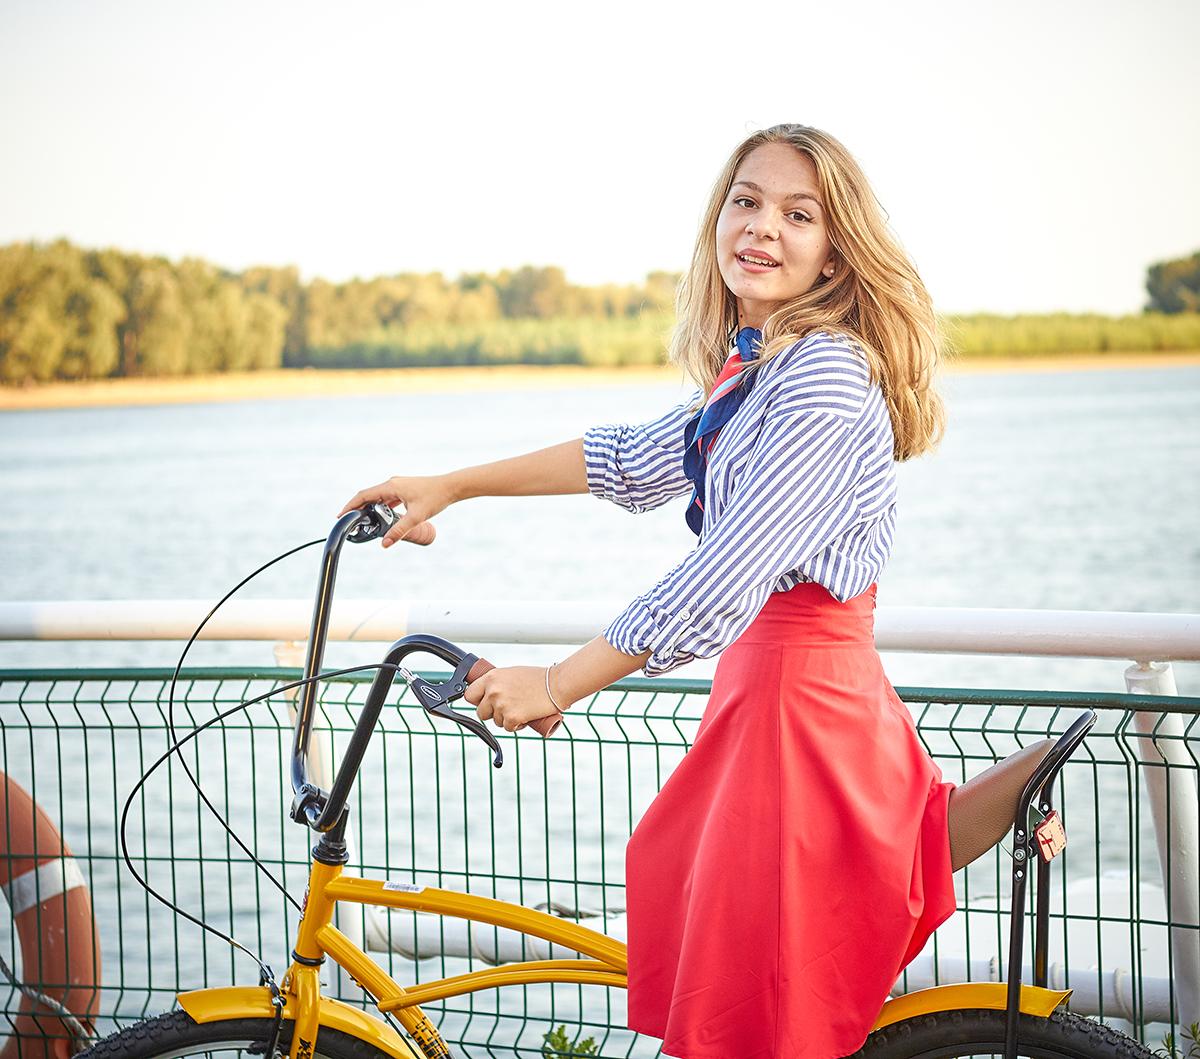 Despre Skirtbike